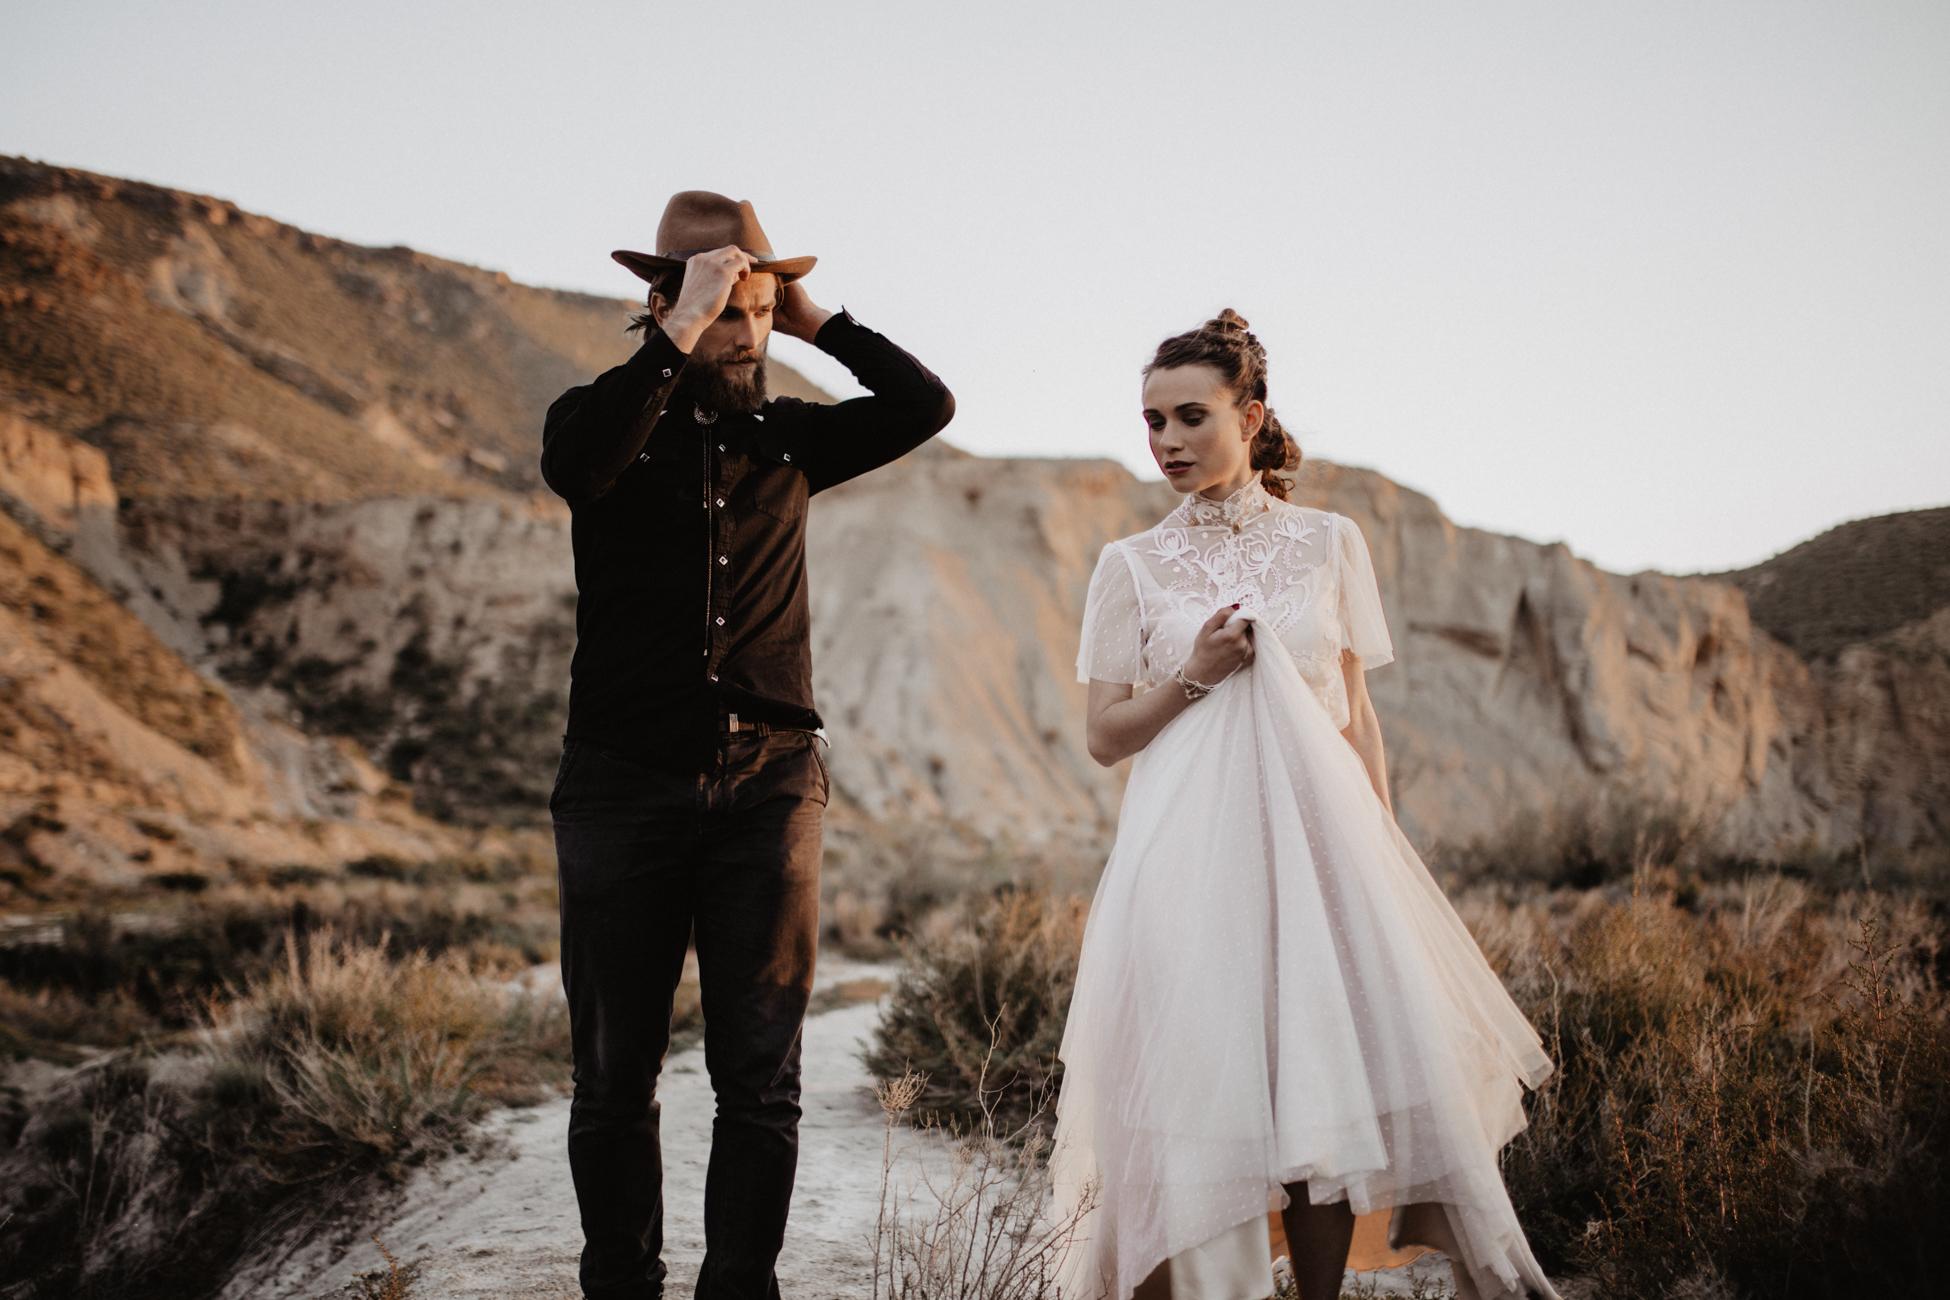 thenortherngirlphotography_photography_thenortherngirl_rebeccascabros_wedding_weddingphotography_weddingphotographer_wood_muebles_deco_bodasdecaramelo_home_bedtime_gaywedding_editorial_desierto_desert_wildestdreams_amortexano-338.jpg